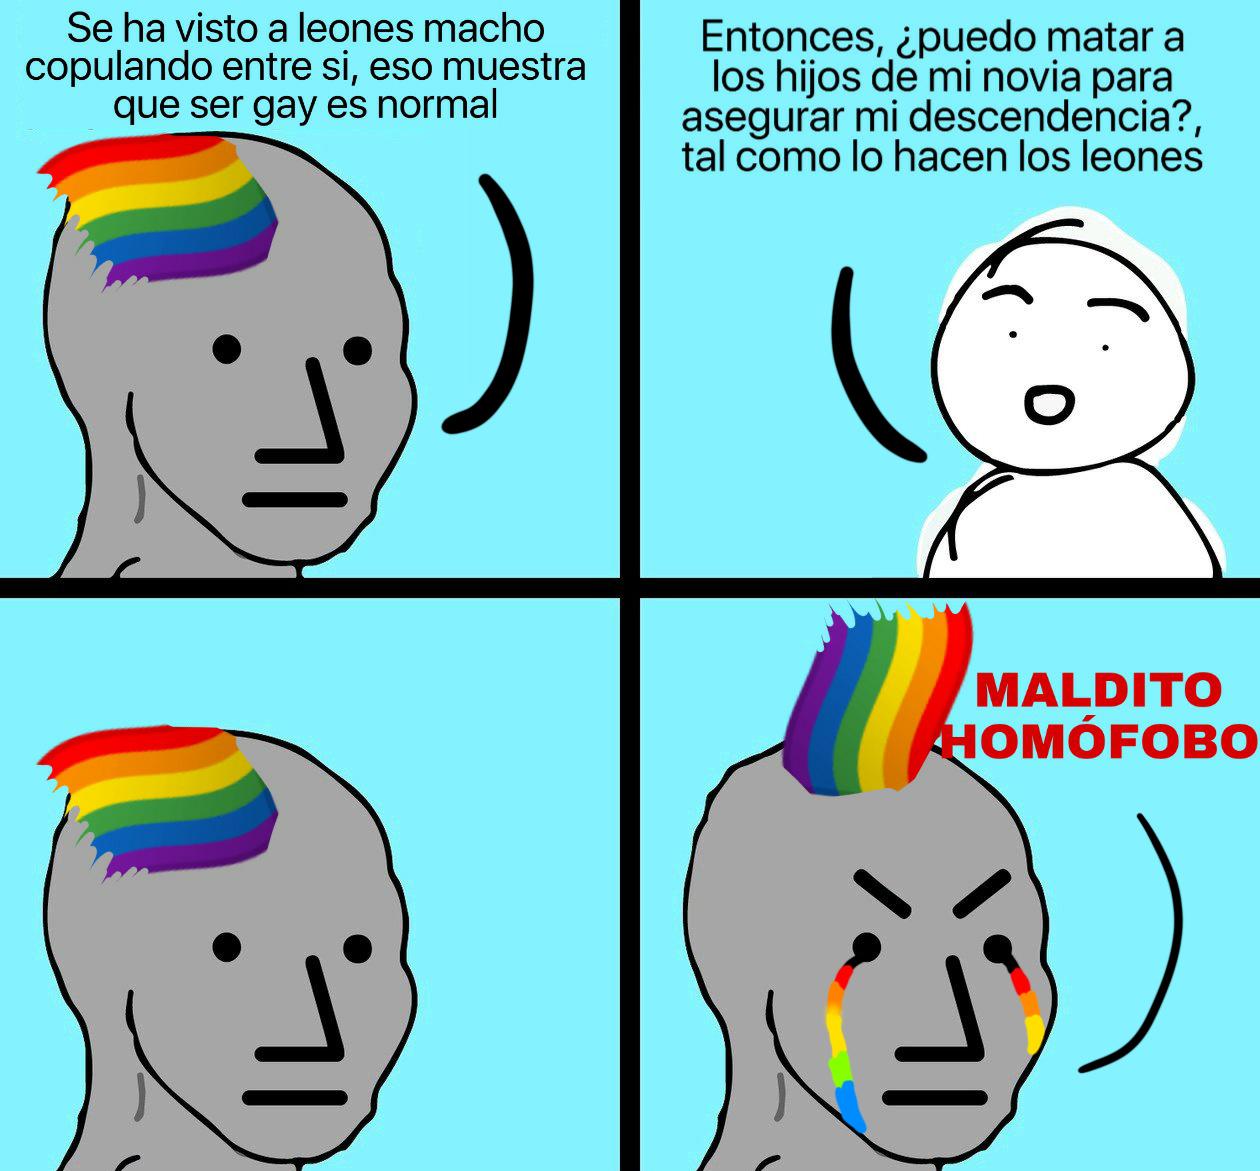 NPC llorando, simplemente maravilloso - meme